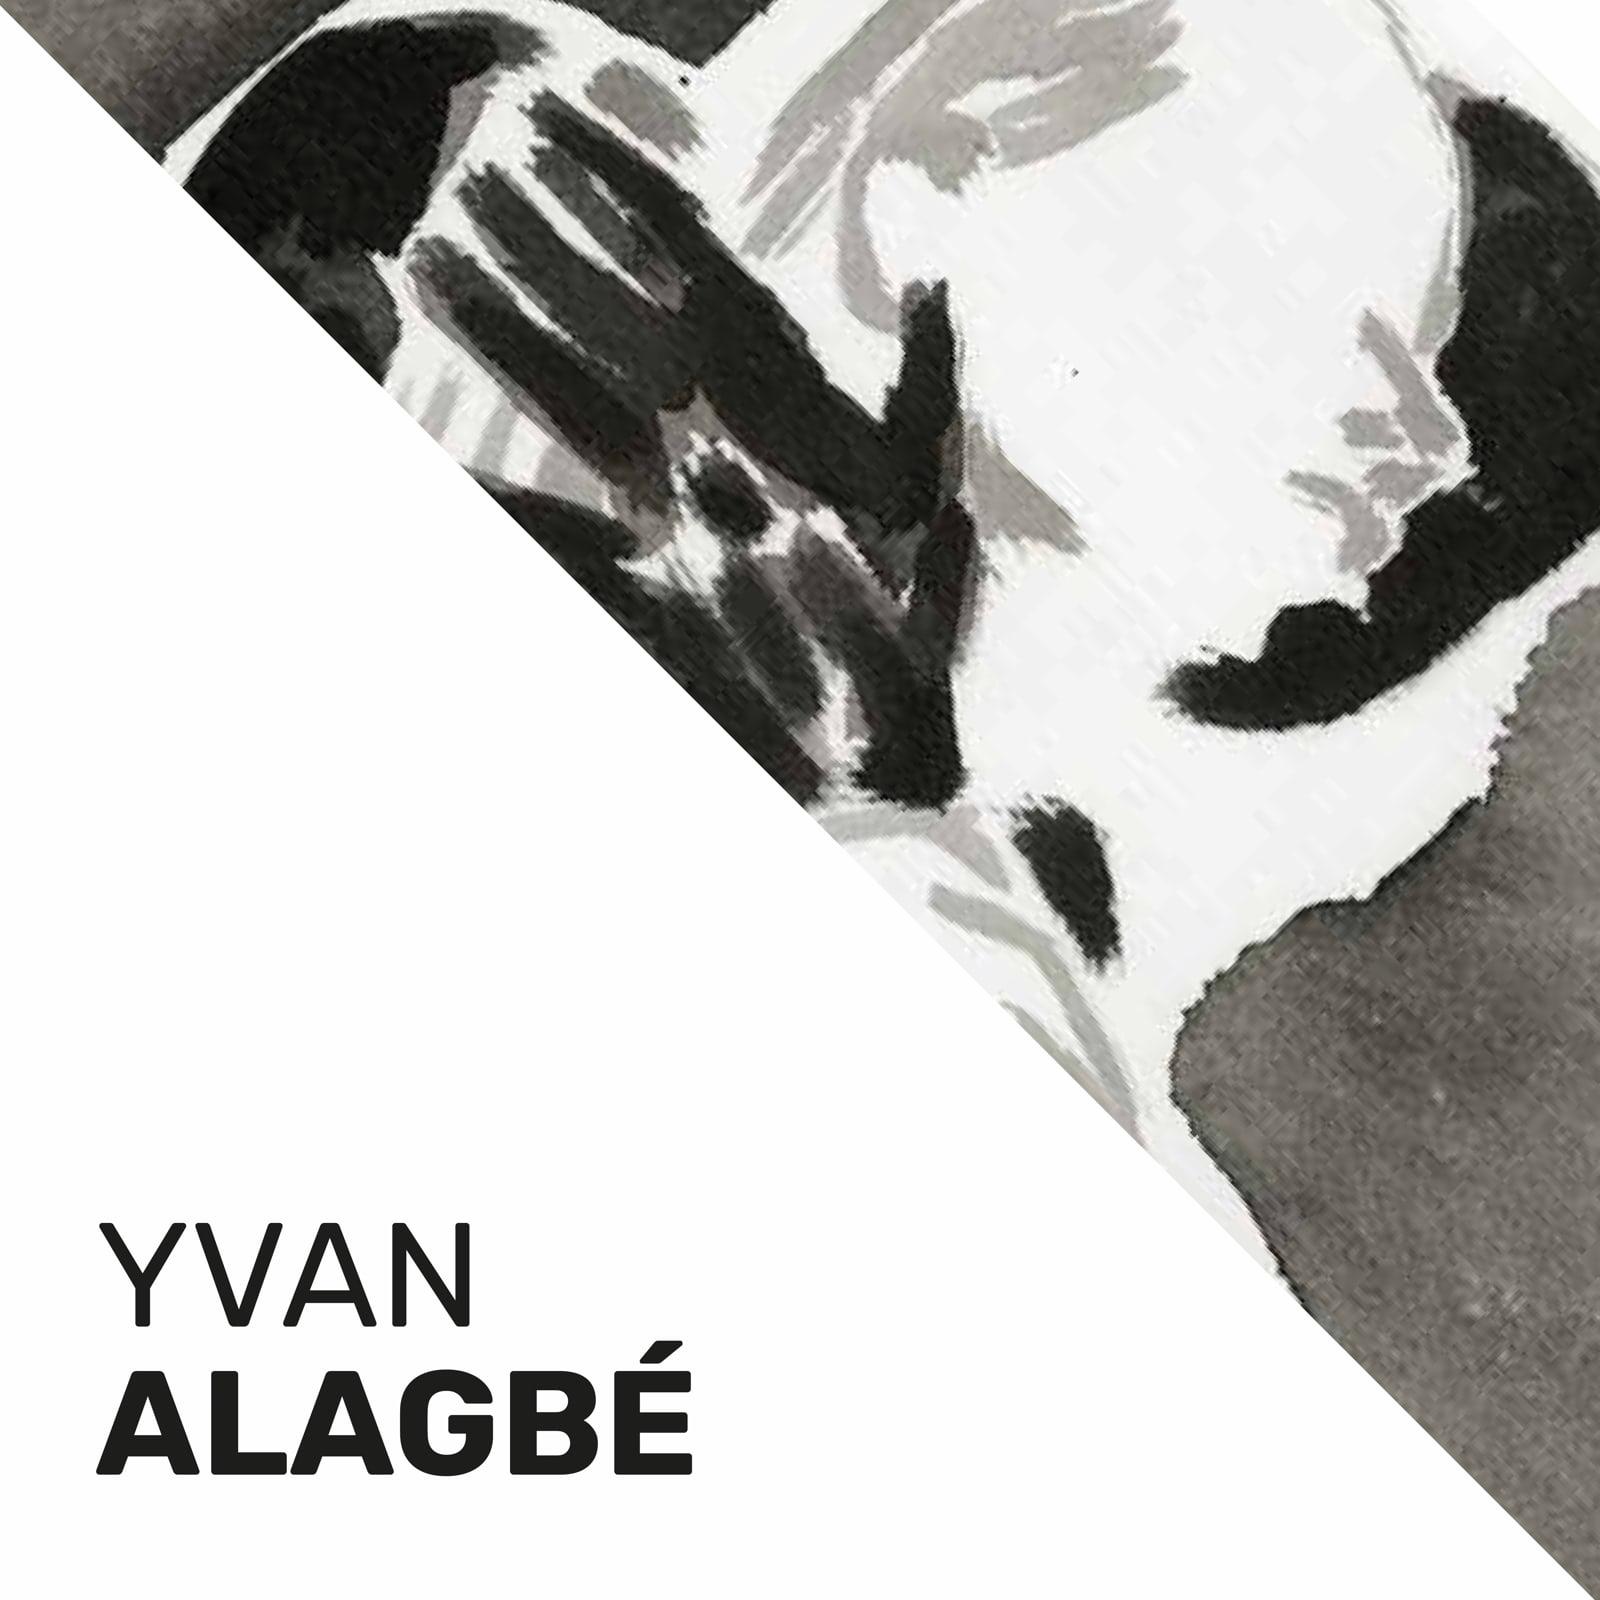 Yvan Alagbe 1